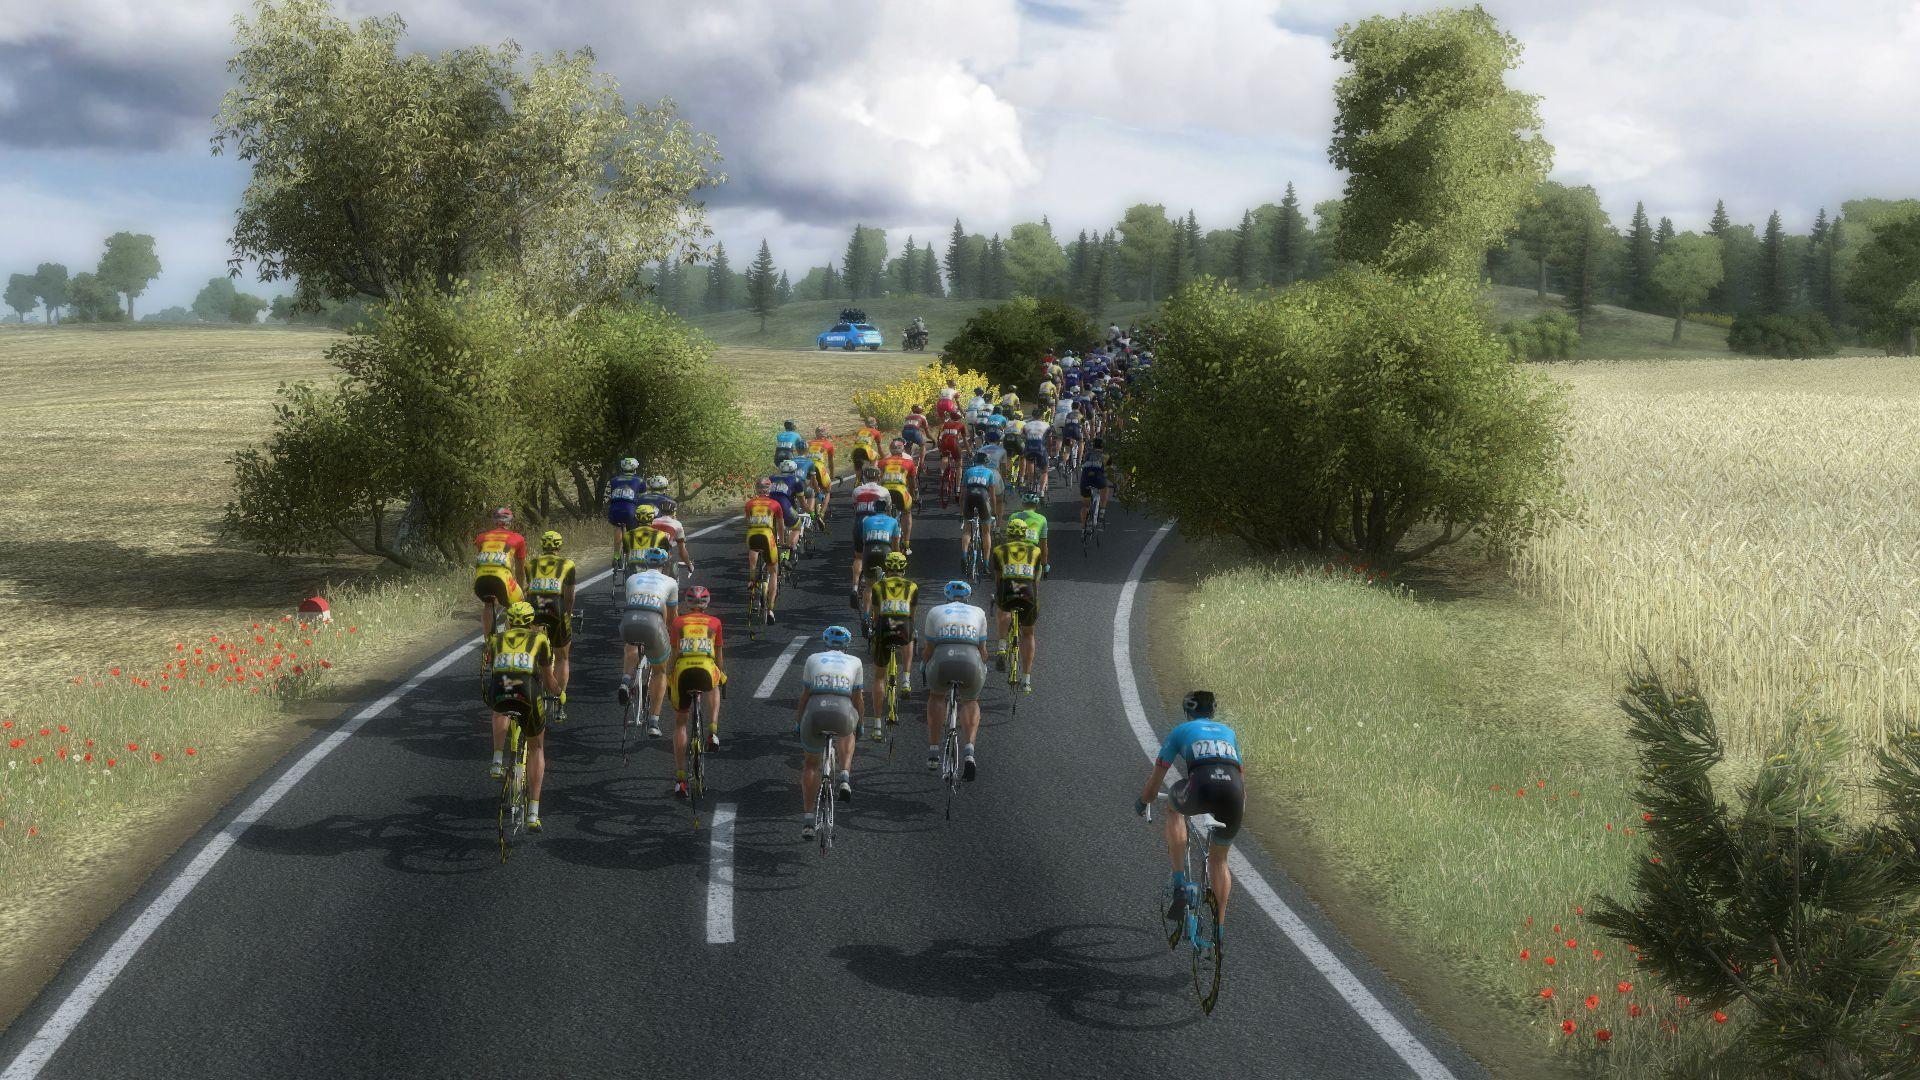 pcmdaily.com/images/mg/2020/Reports/GTM/Giro/S07/mg20_giro_s07_11.jpg